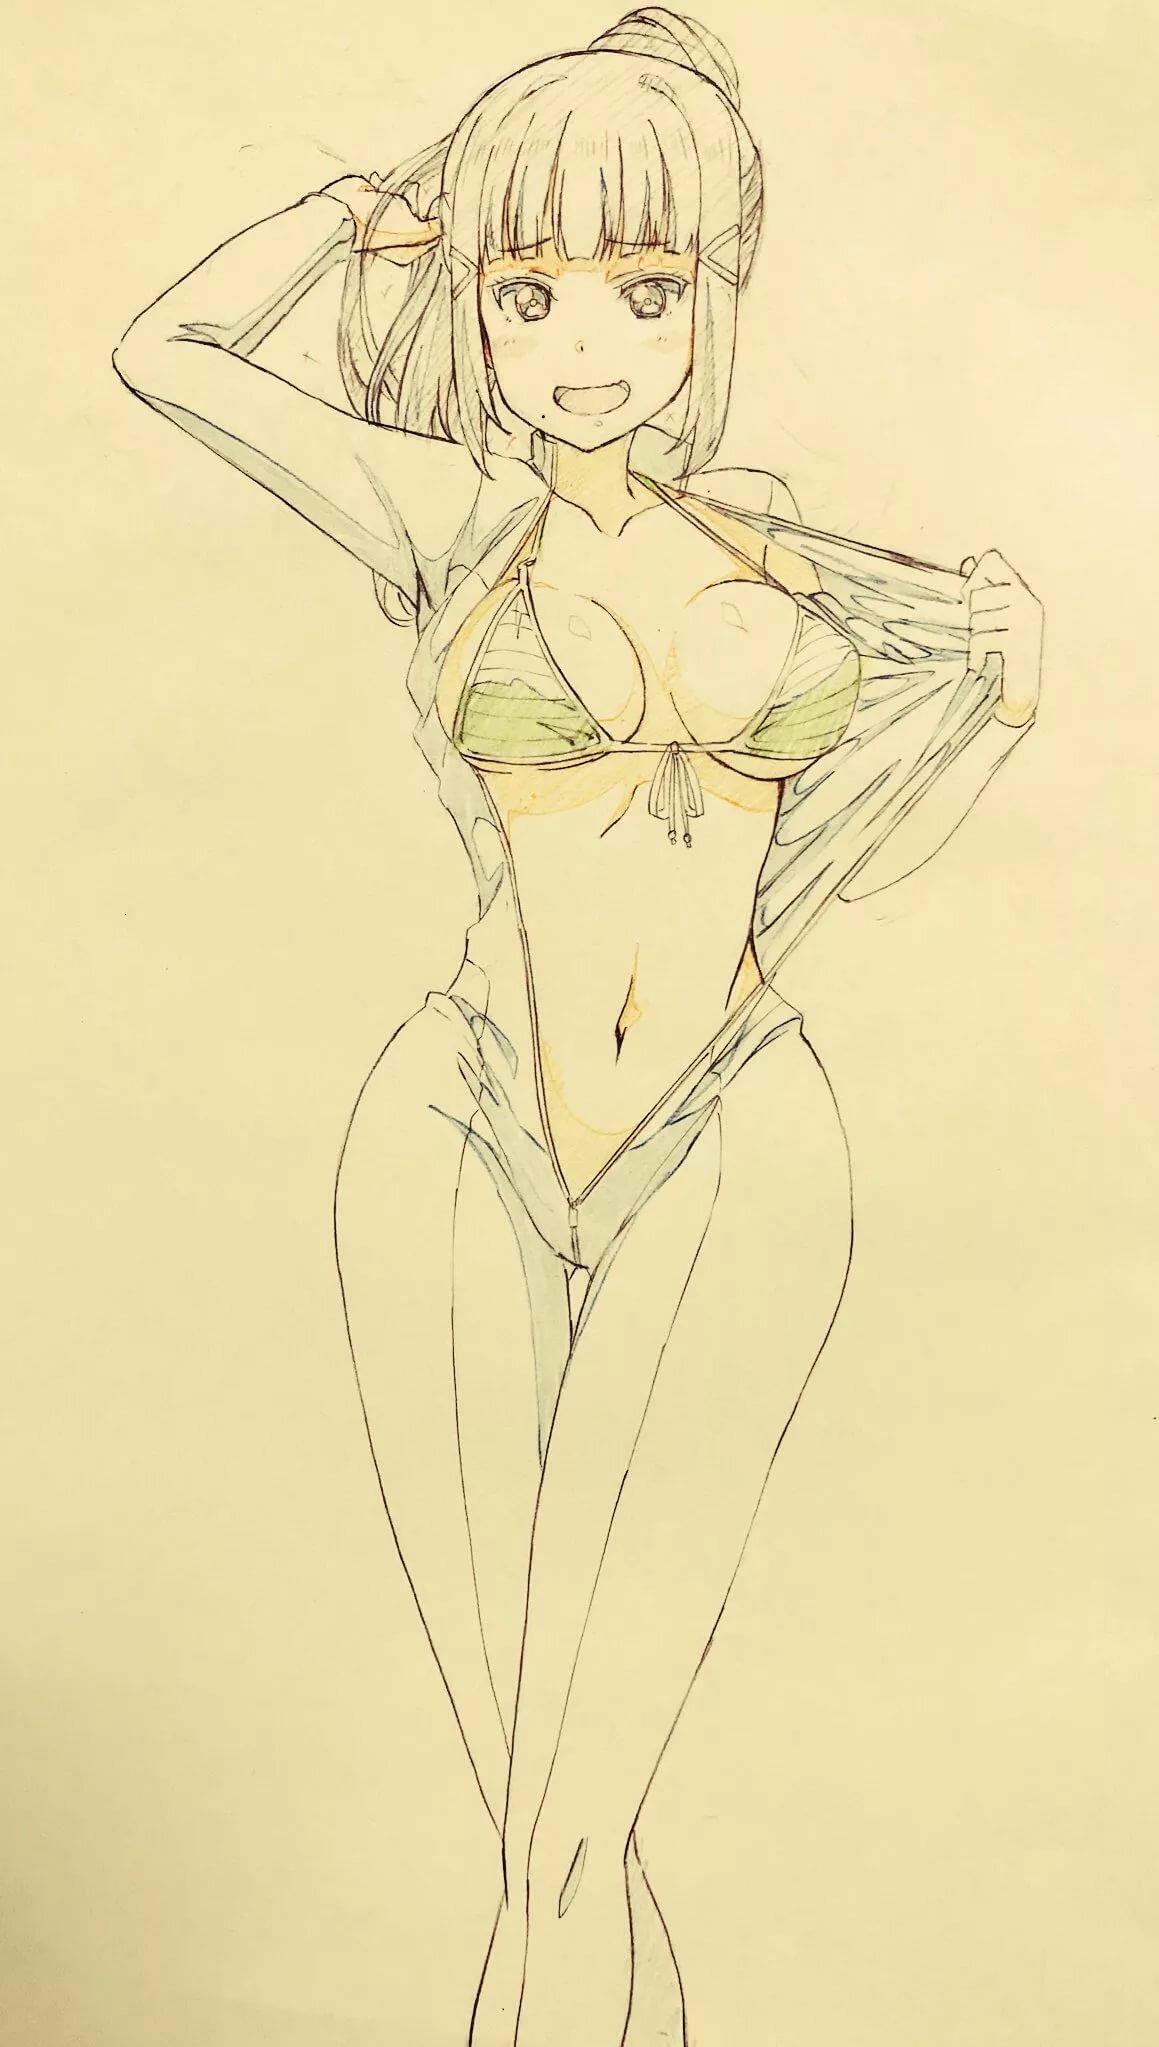 Sexy anime sketches